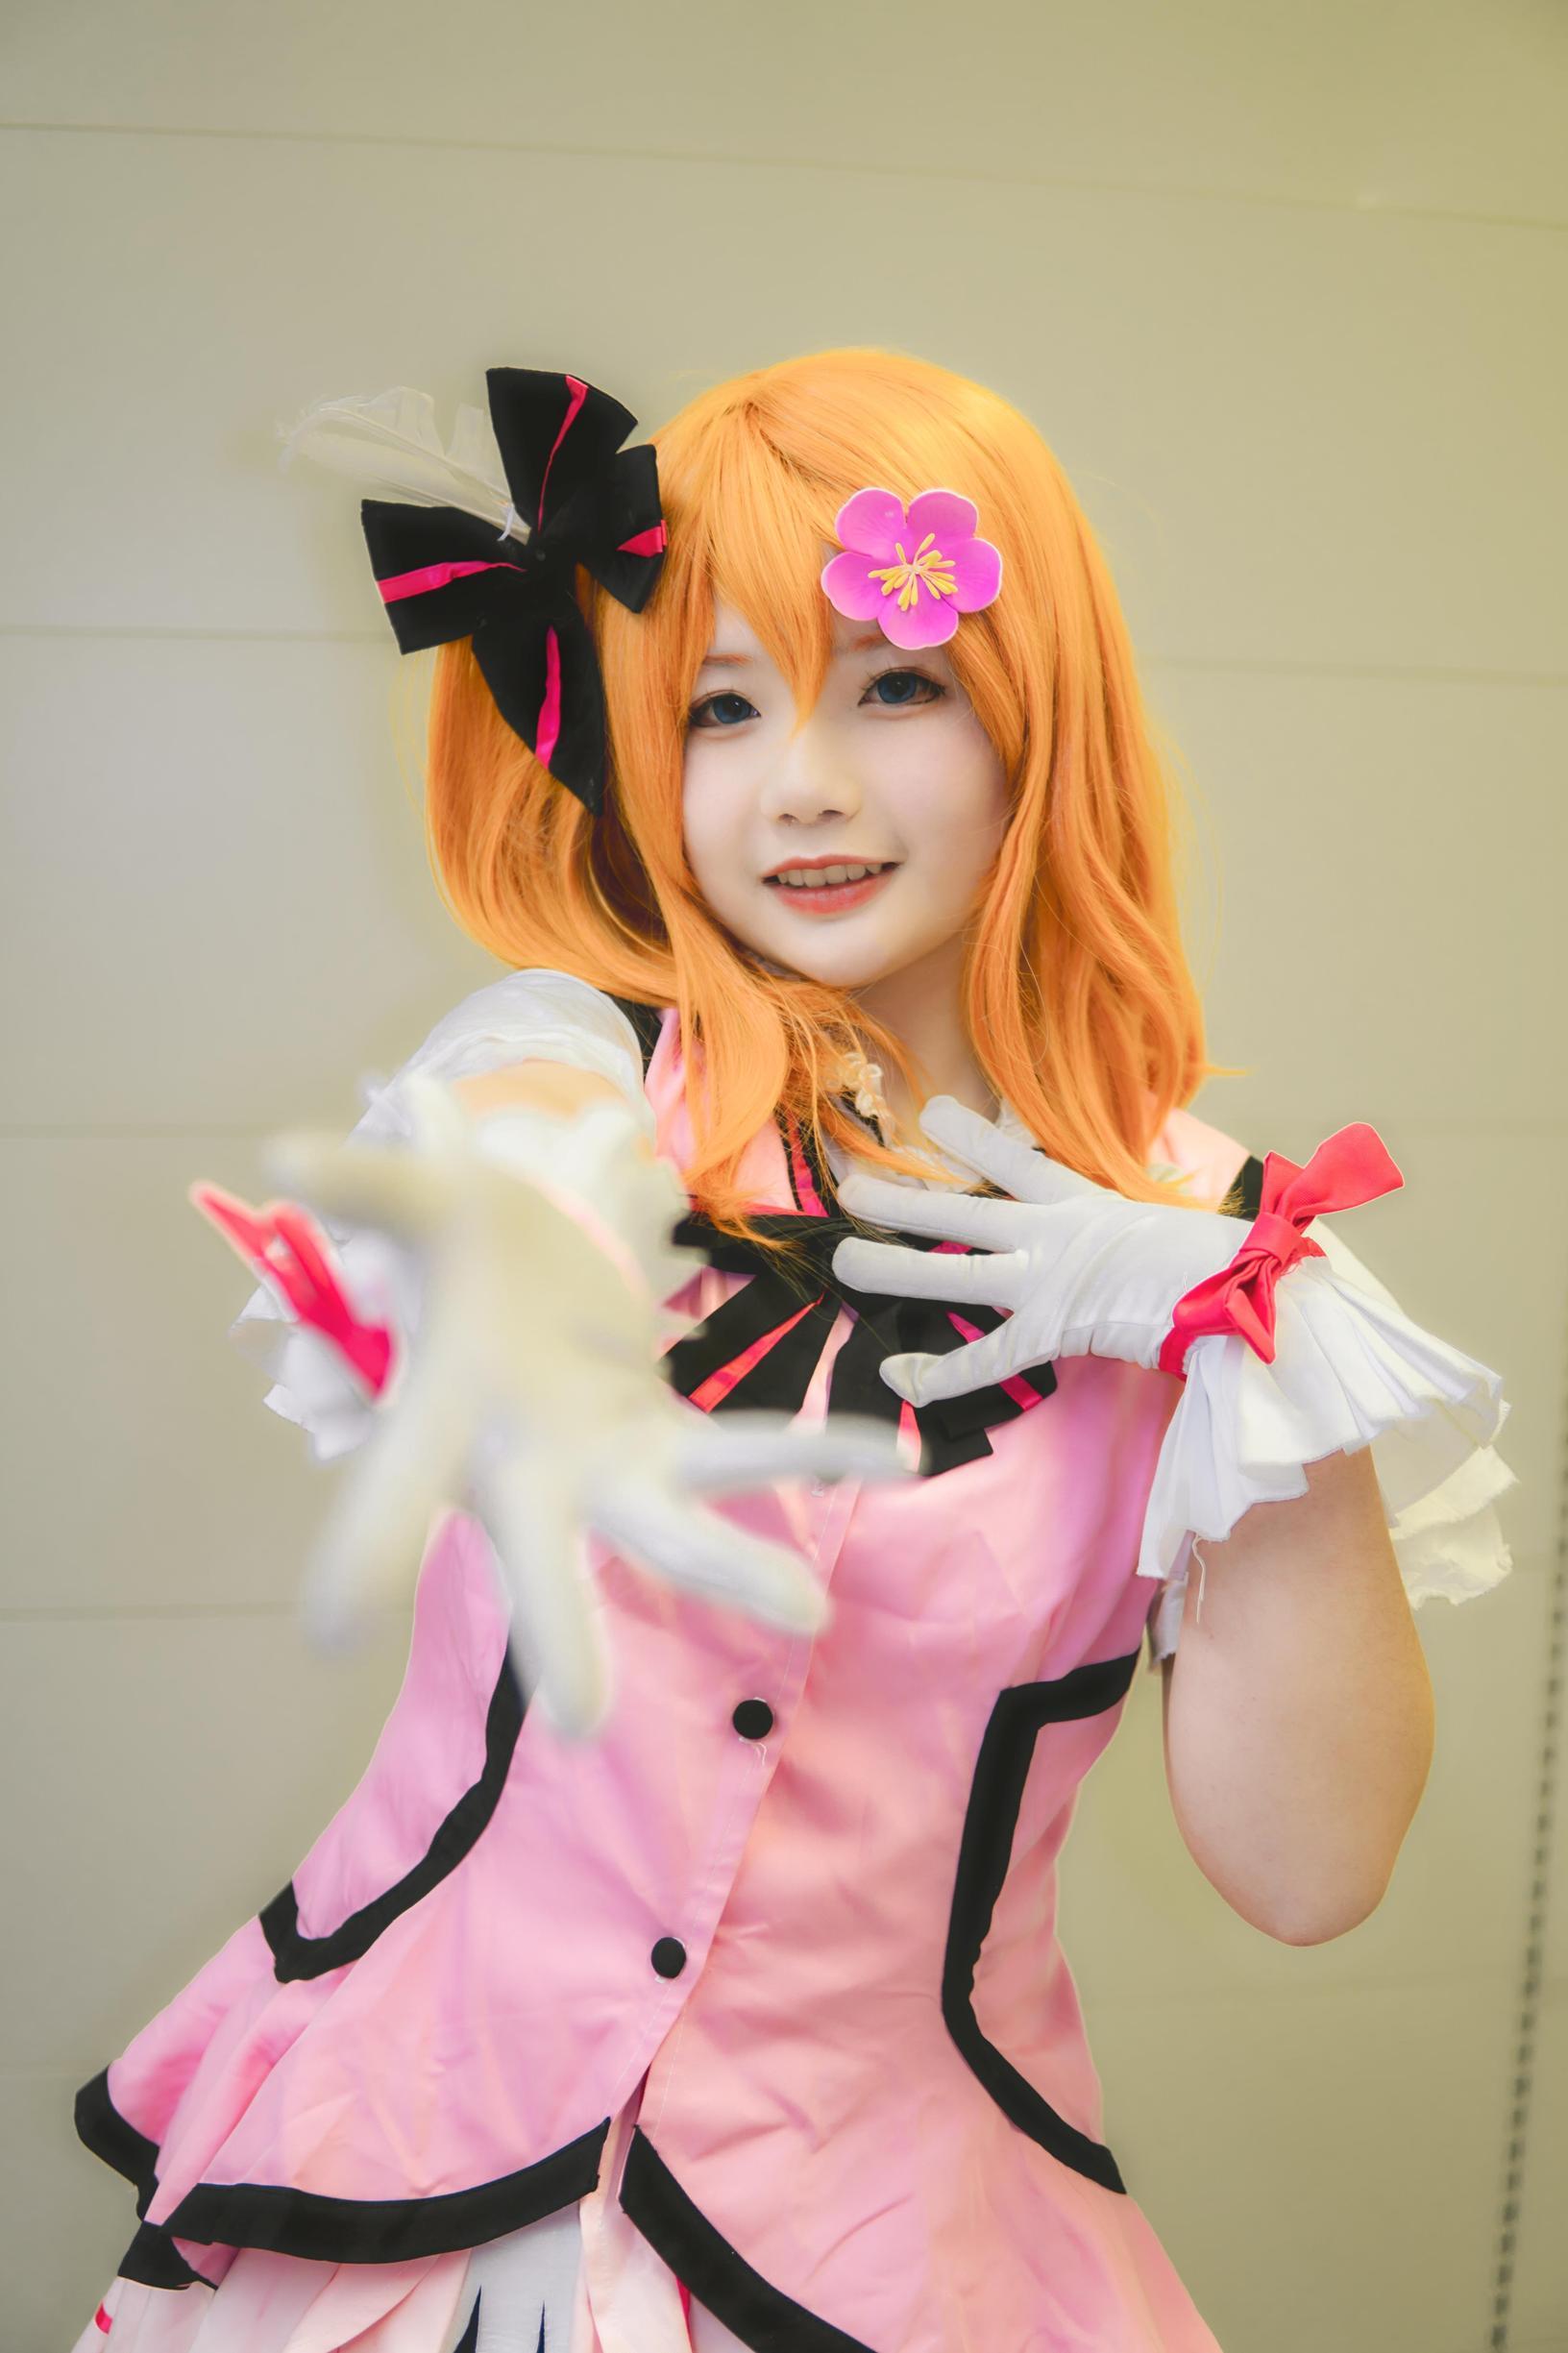 《LOVE LIVE!》高坂穗乃果cosplay【CN:羡雨.】-第7张